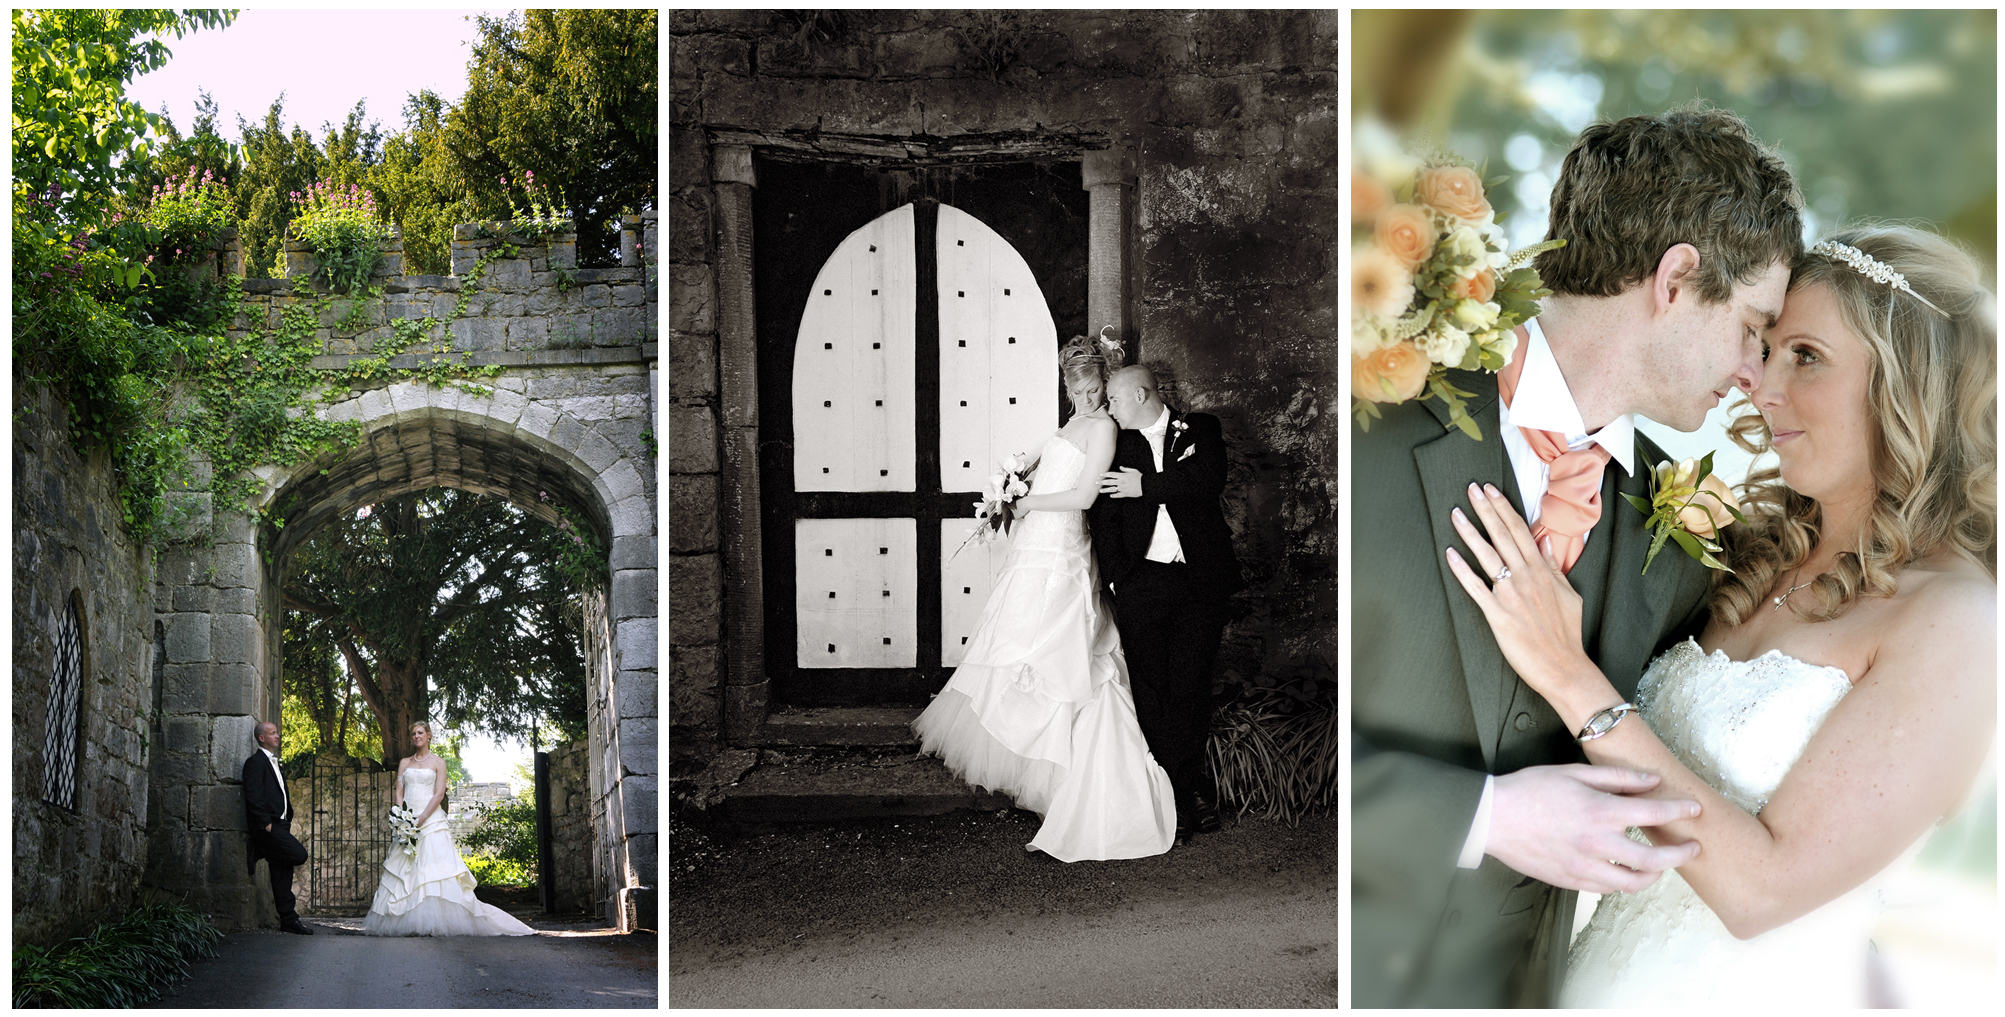 Brides, Grooms, wedding photo